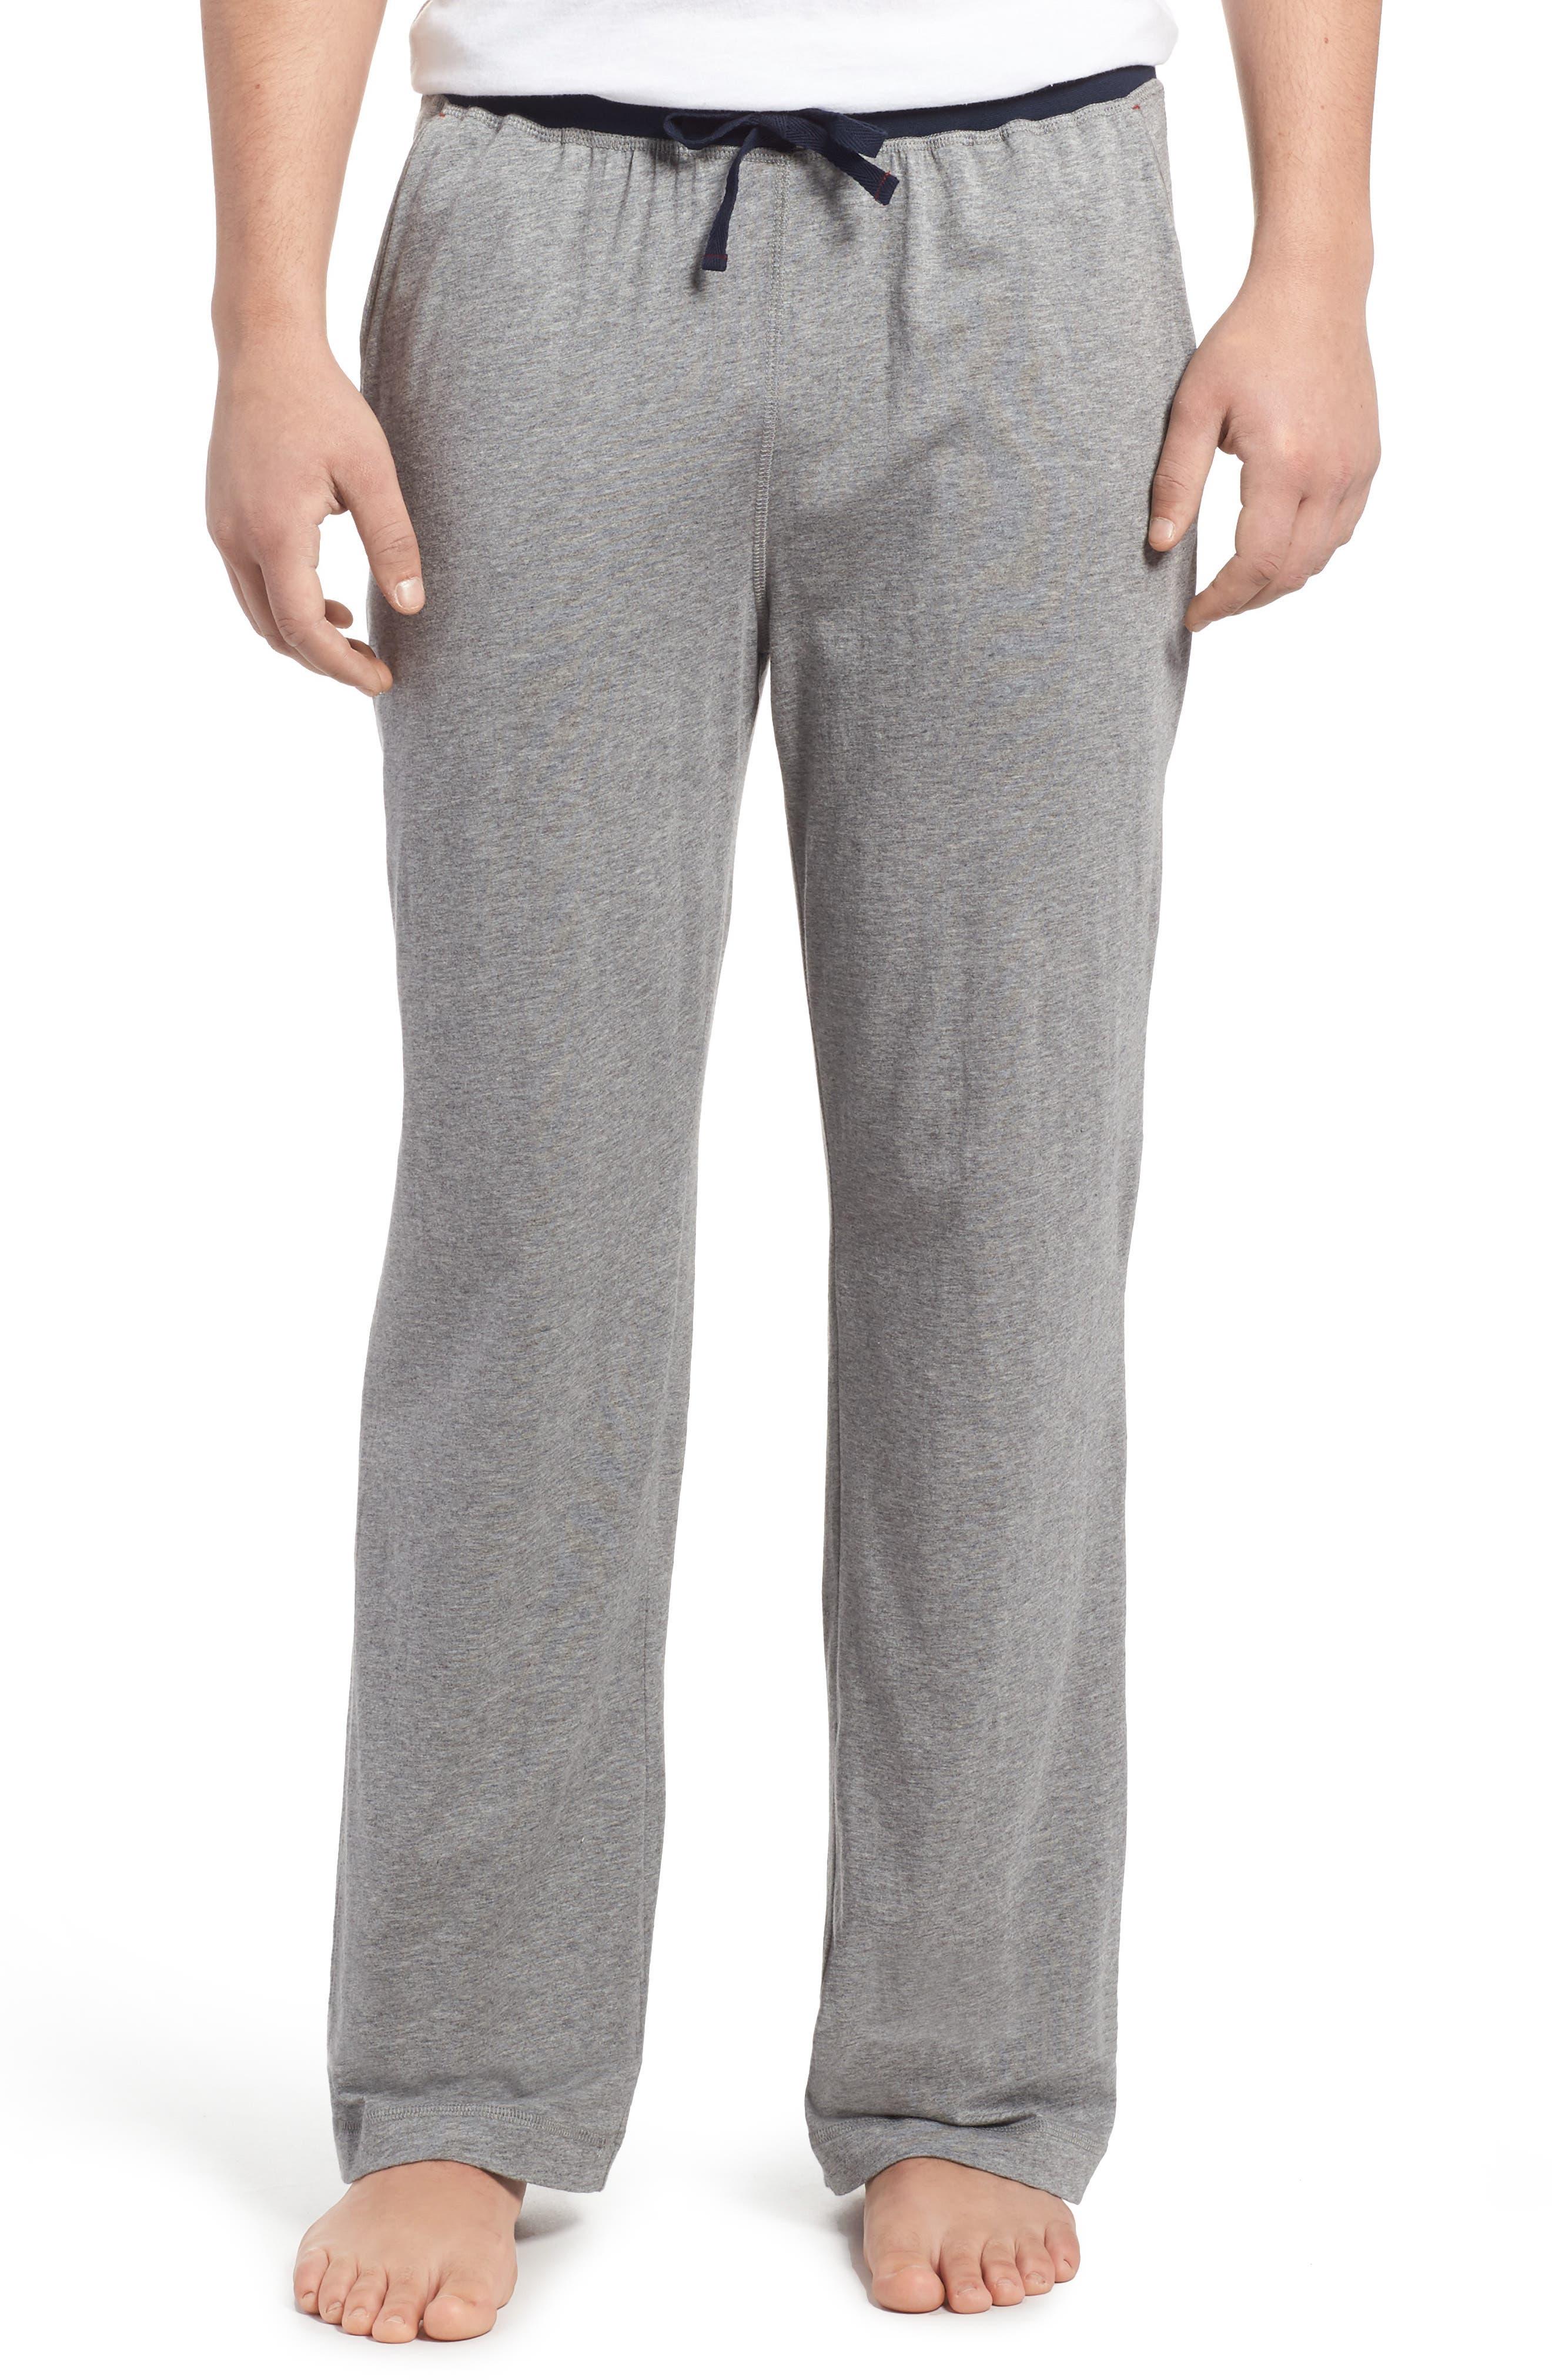 Pima Cotton & Modal Lounge Pants,                             Main thumbnail 1, color,                             Grey Heather